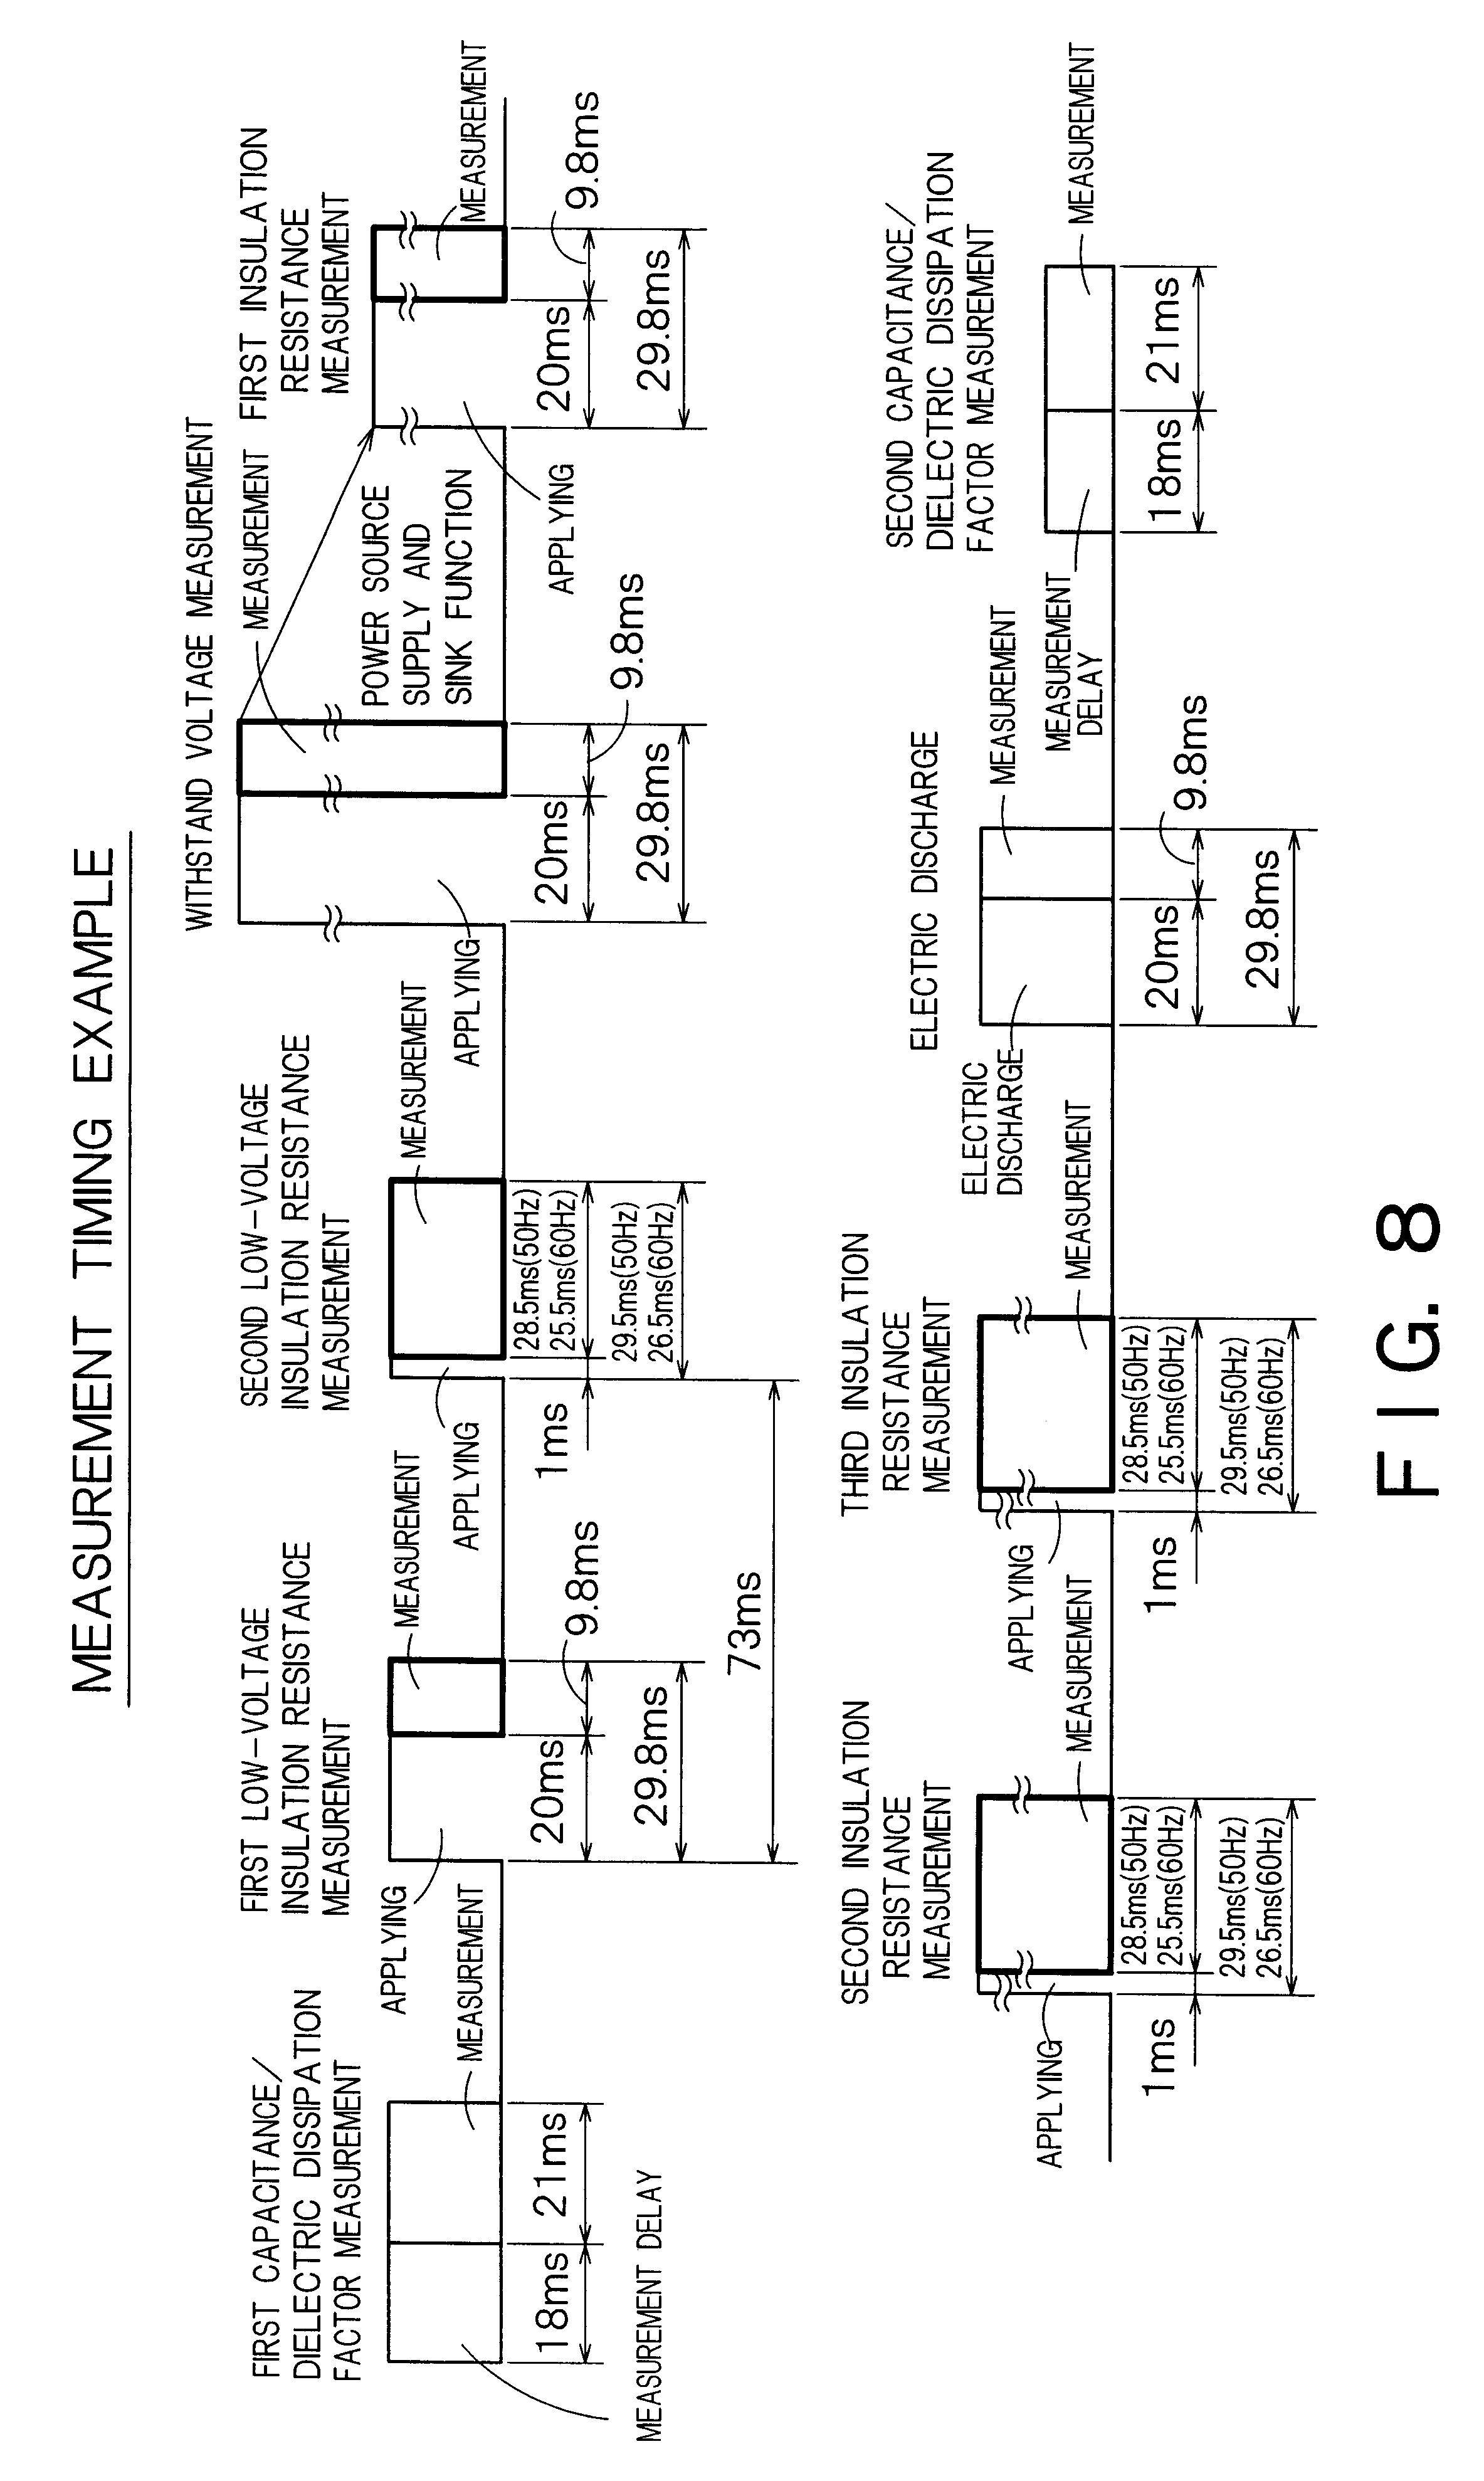 Patente Us6642721 Method Of Measuring Insulation Resistance Power Factor Meter Circuit Patent Drawing